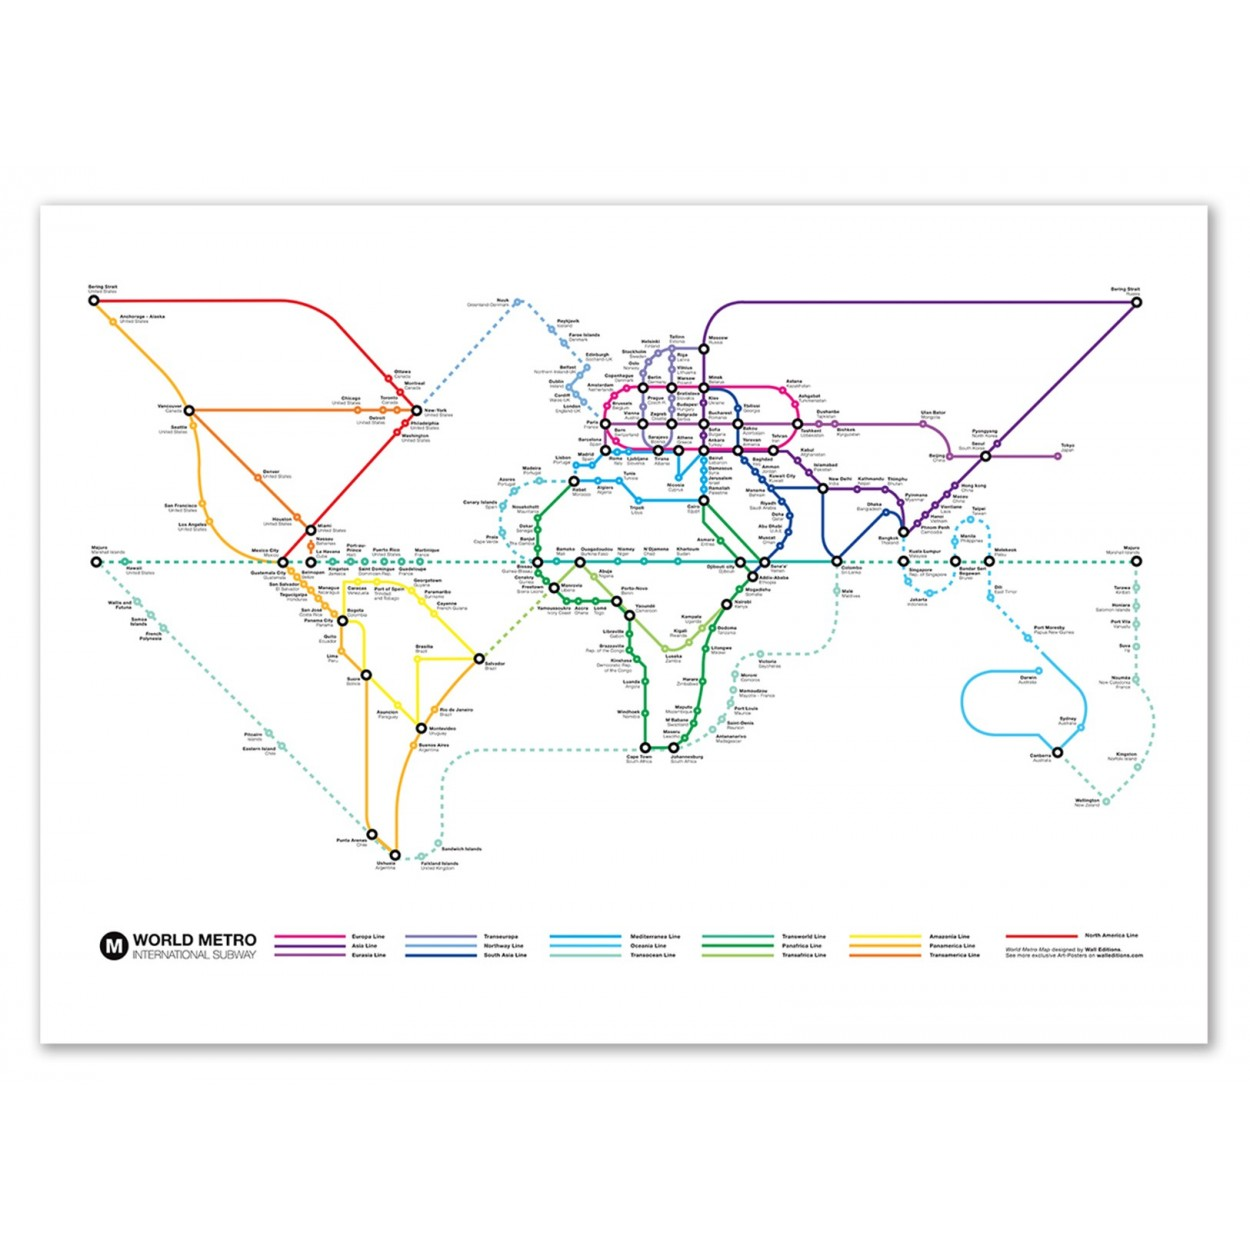 Tokyo Subway Map Framed.Poster Print And Design Of International Subway World Map